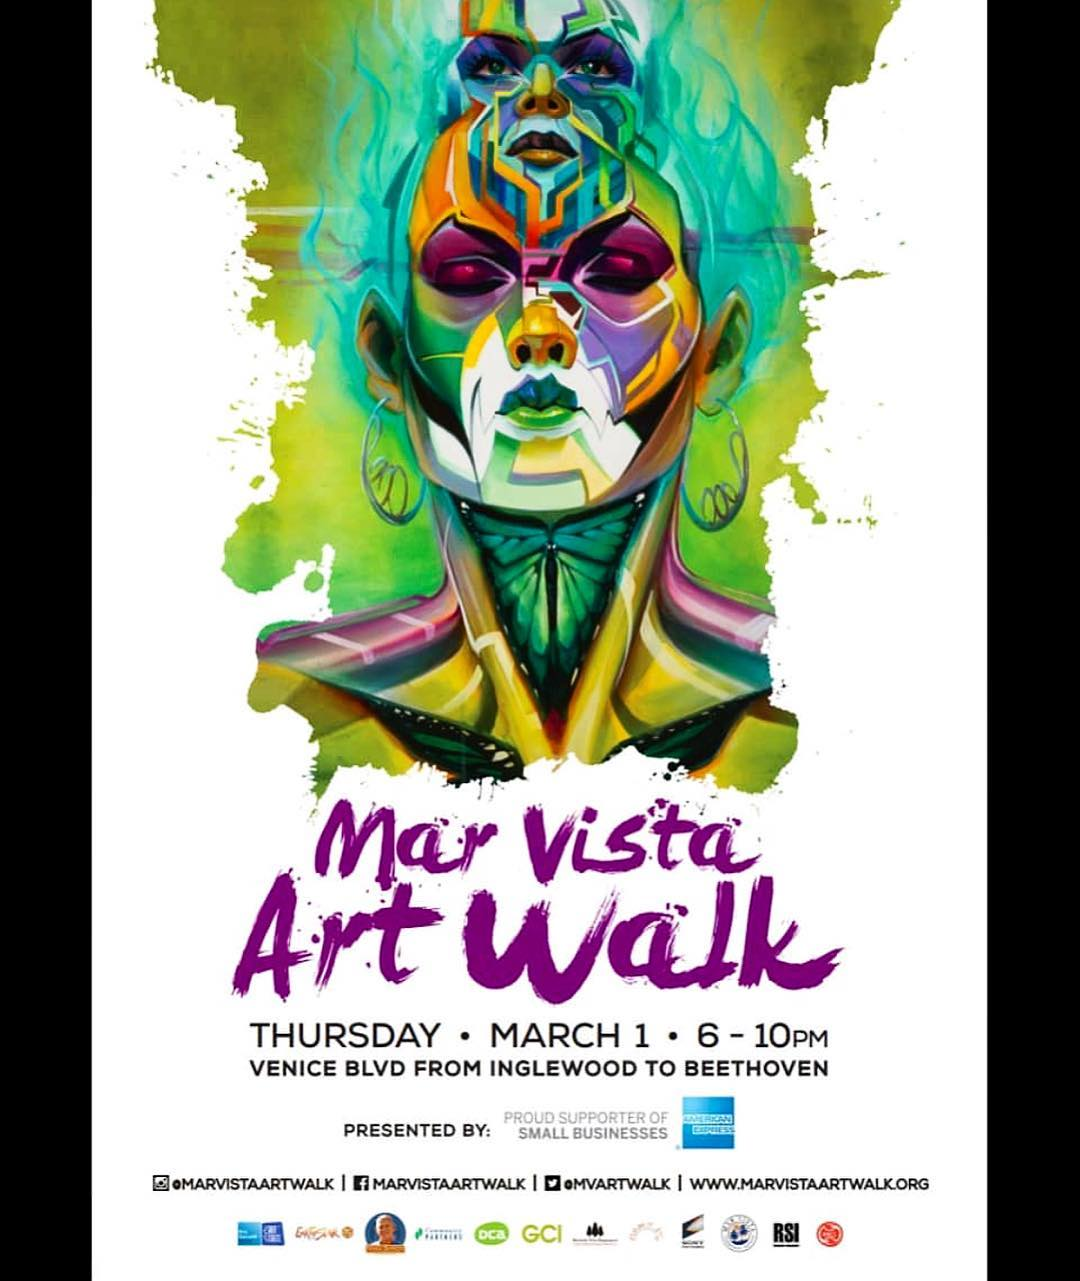 Surgeon Marta at the Mar Vista Art Walk